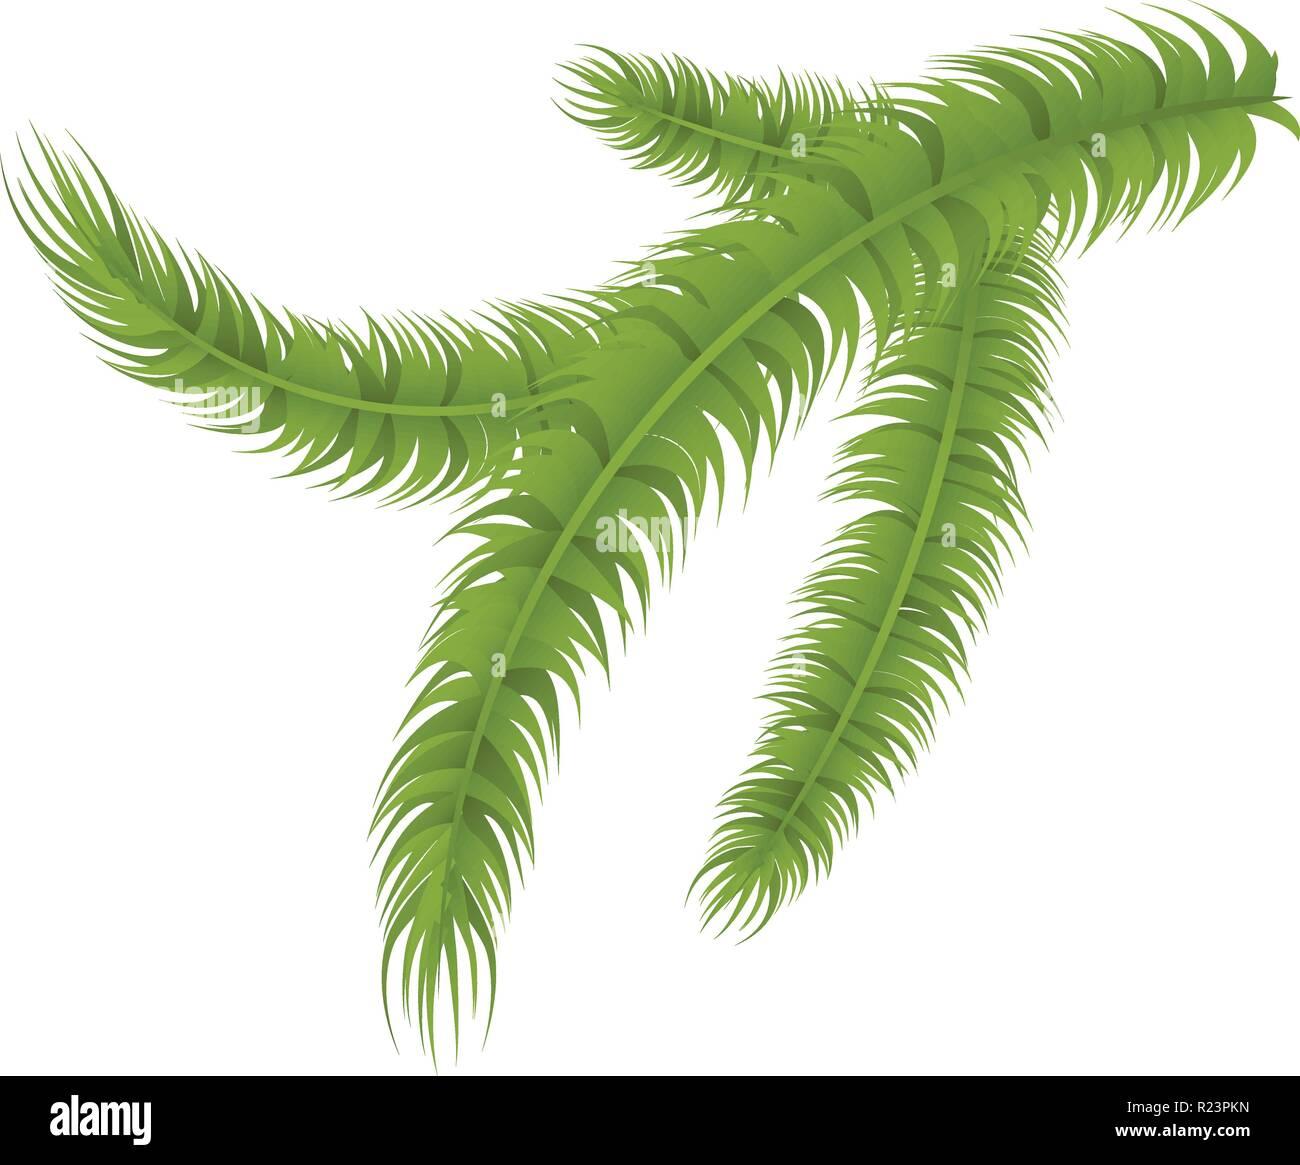 Pine tree branch icon, isometric style - Stock Vector